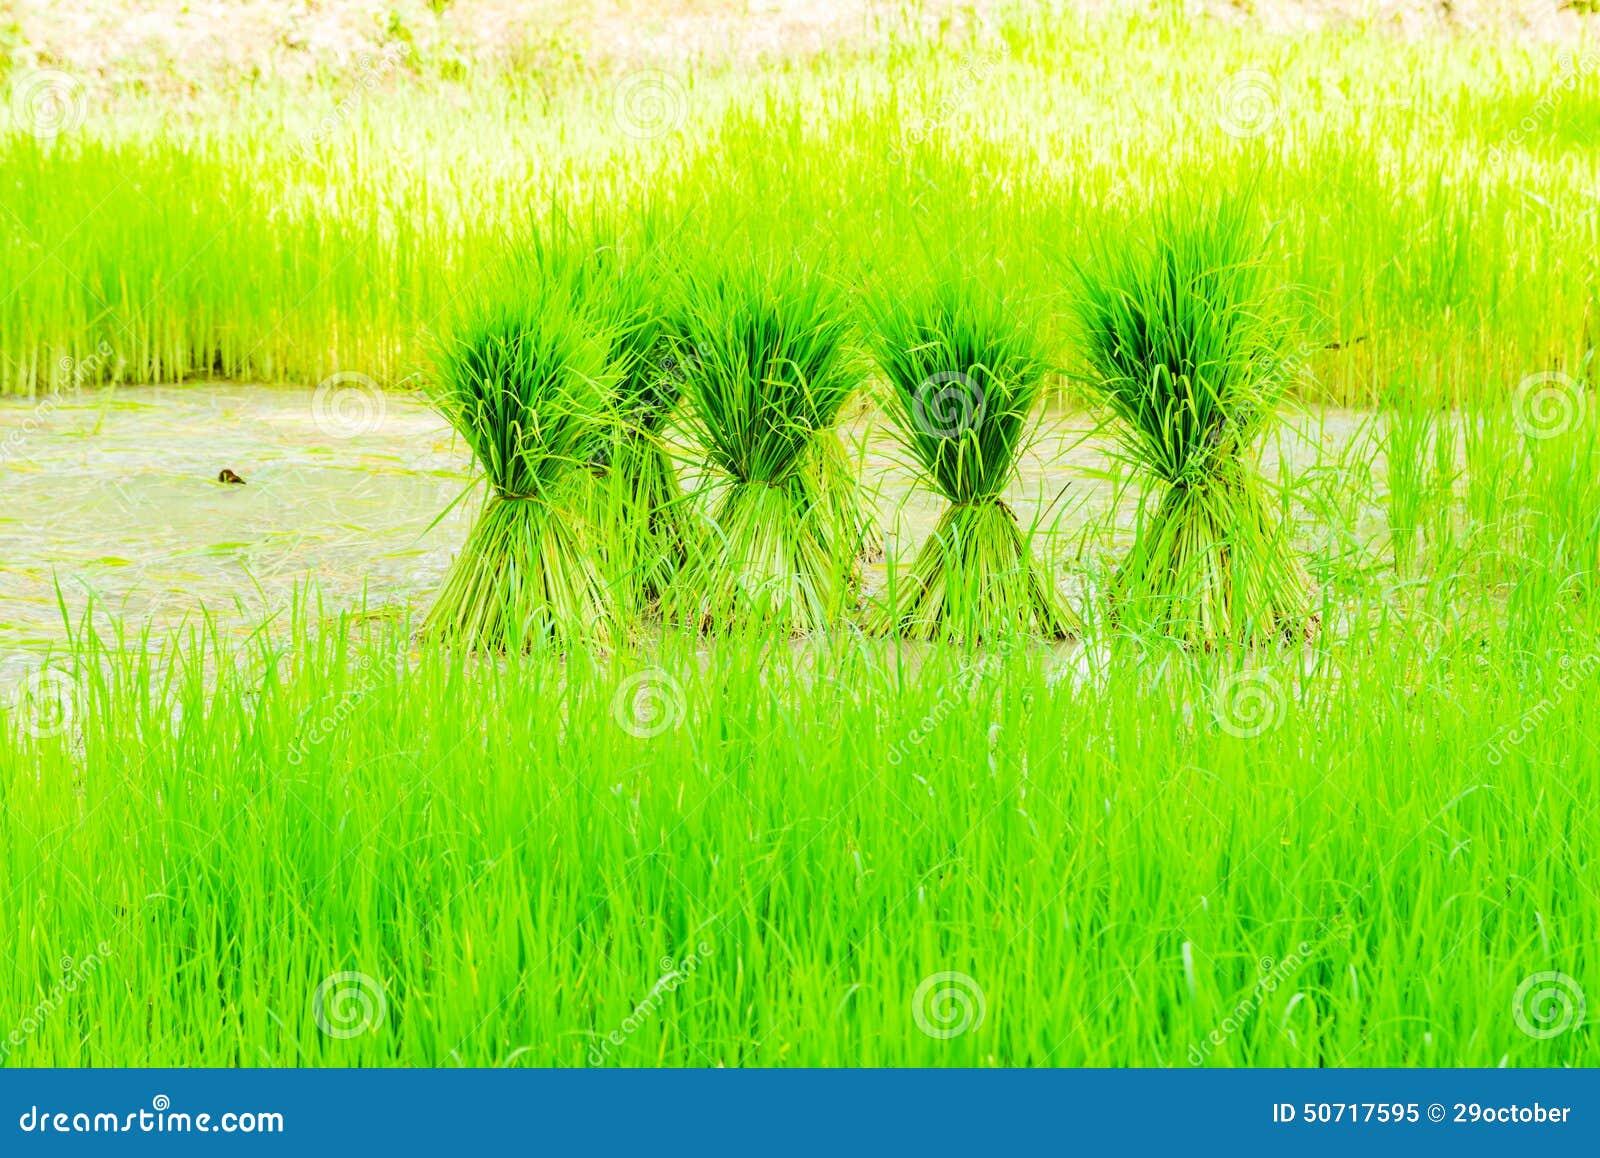 Field rice